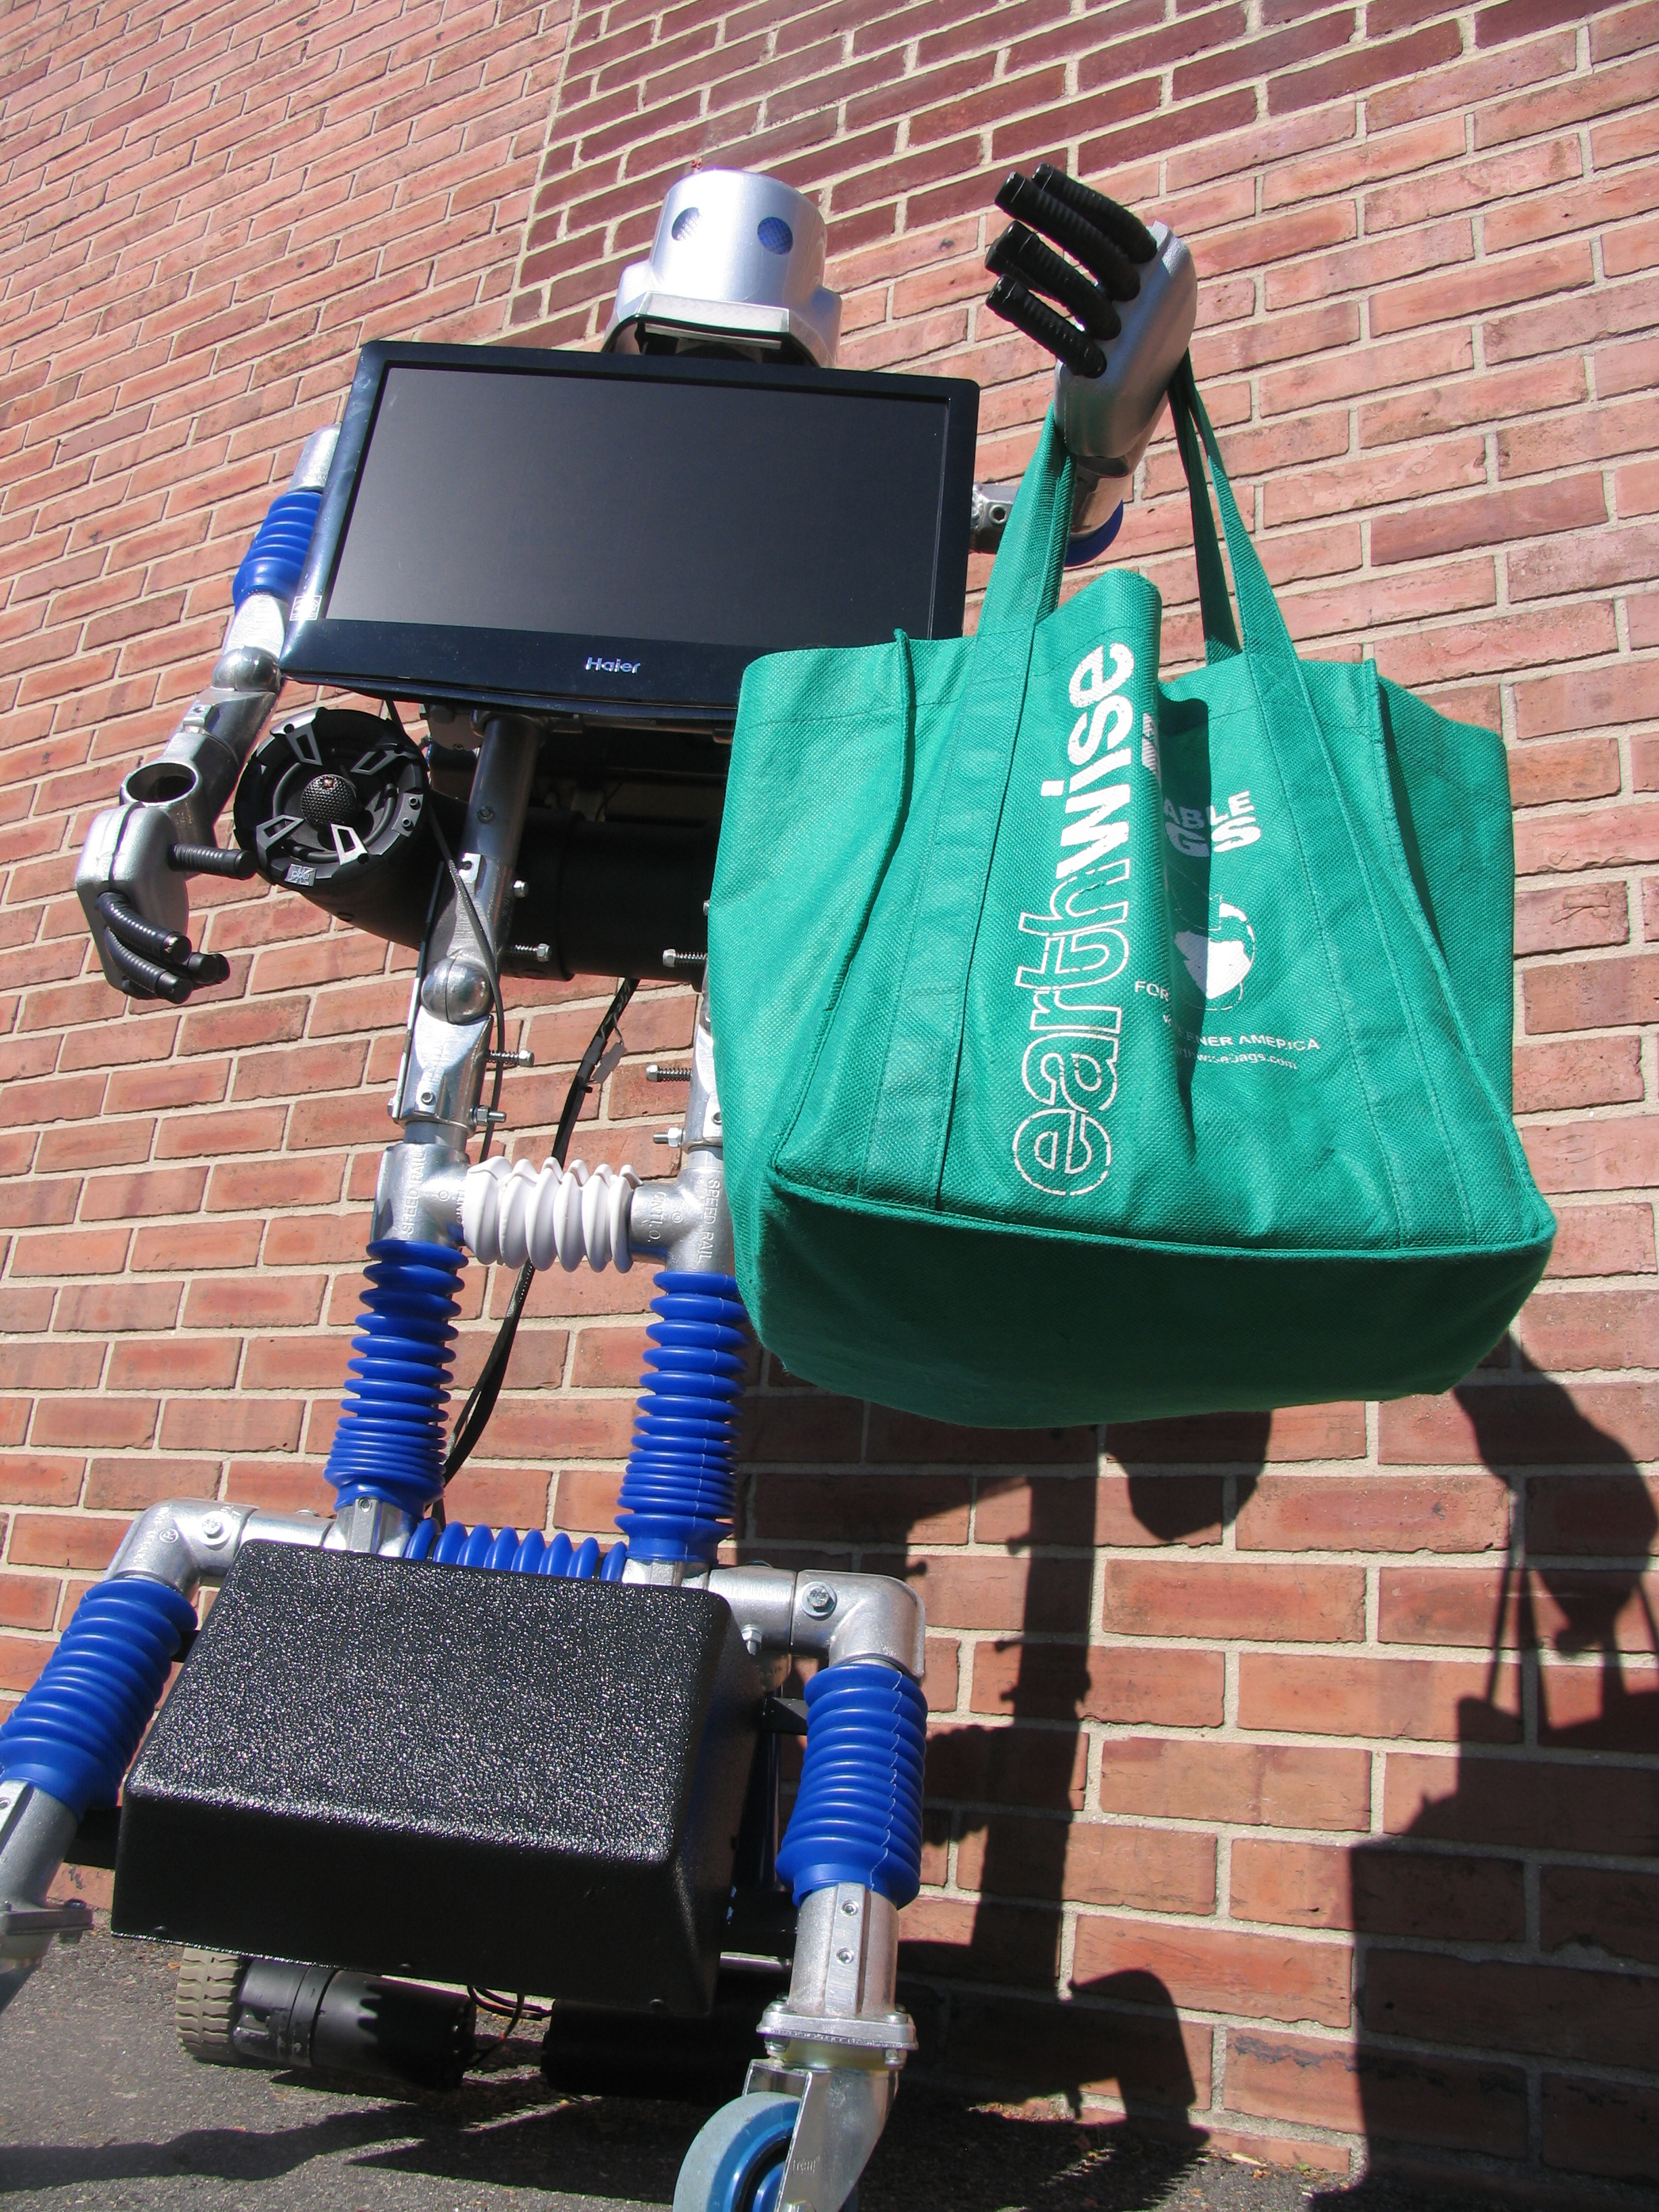 1f5e7c14a4ab7639a072_MC_s_recycling_robot.JPG